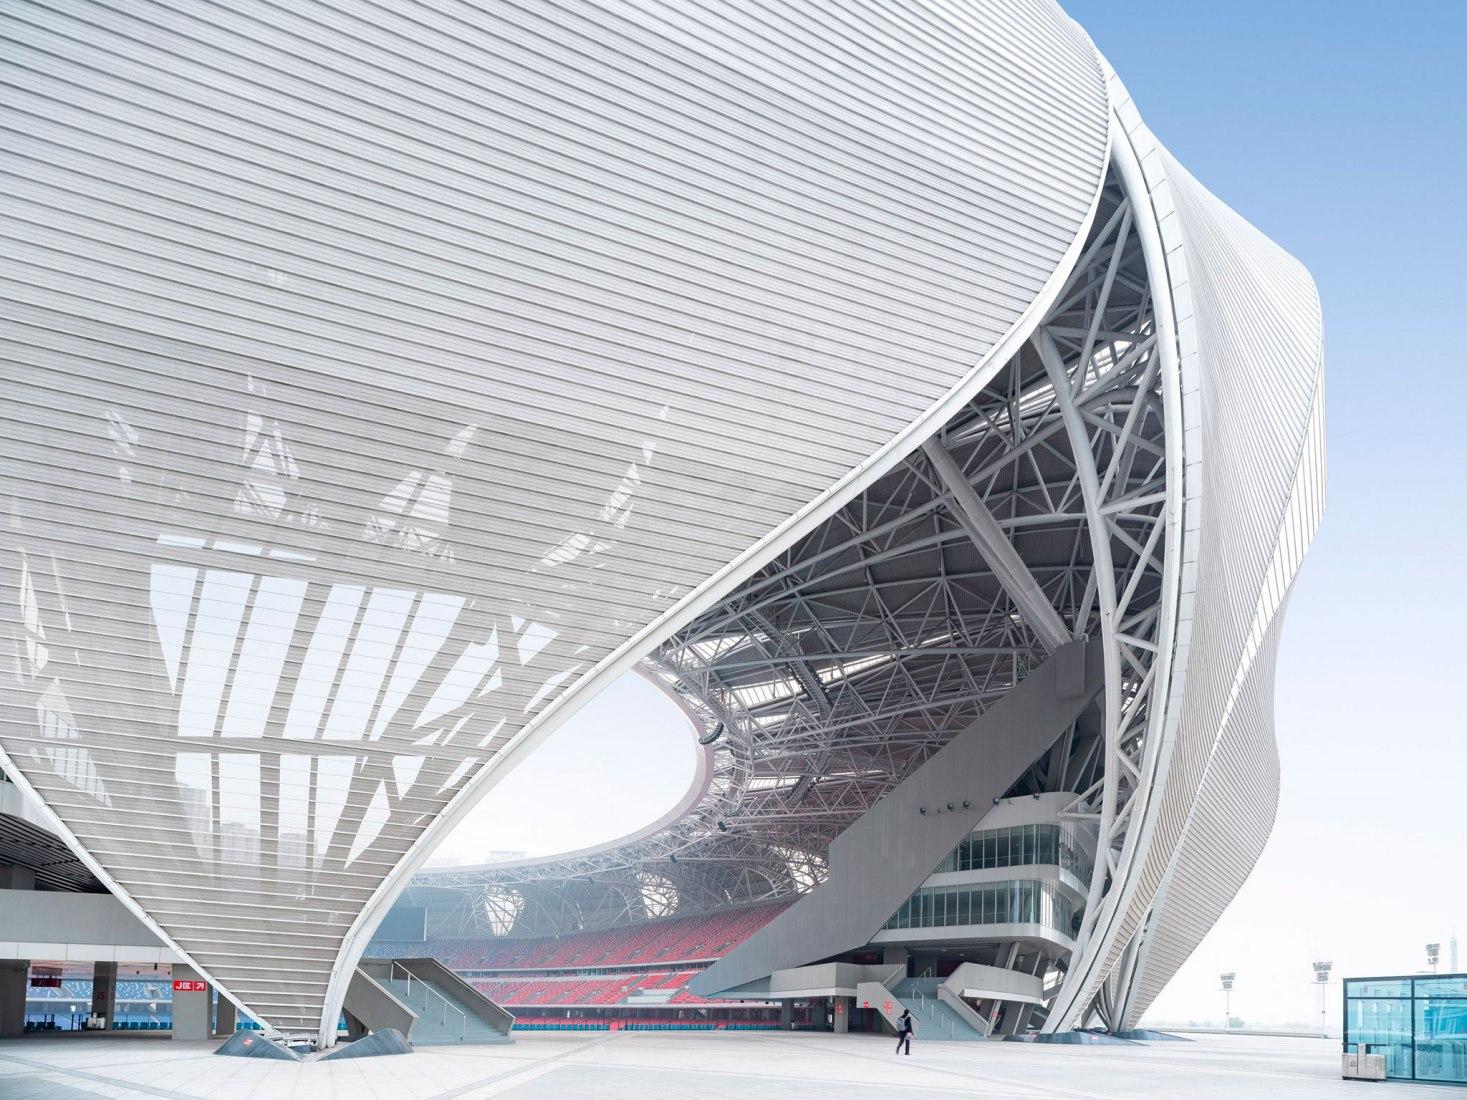 Complejo Deportivo Olímpico de Hangzhou por NBBJ. Fotografía por Shao Feng